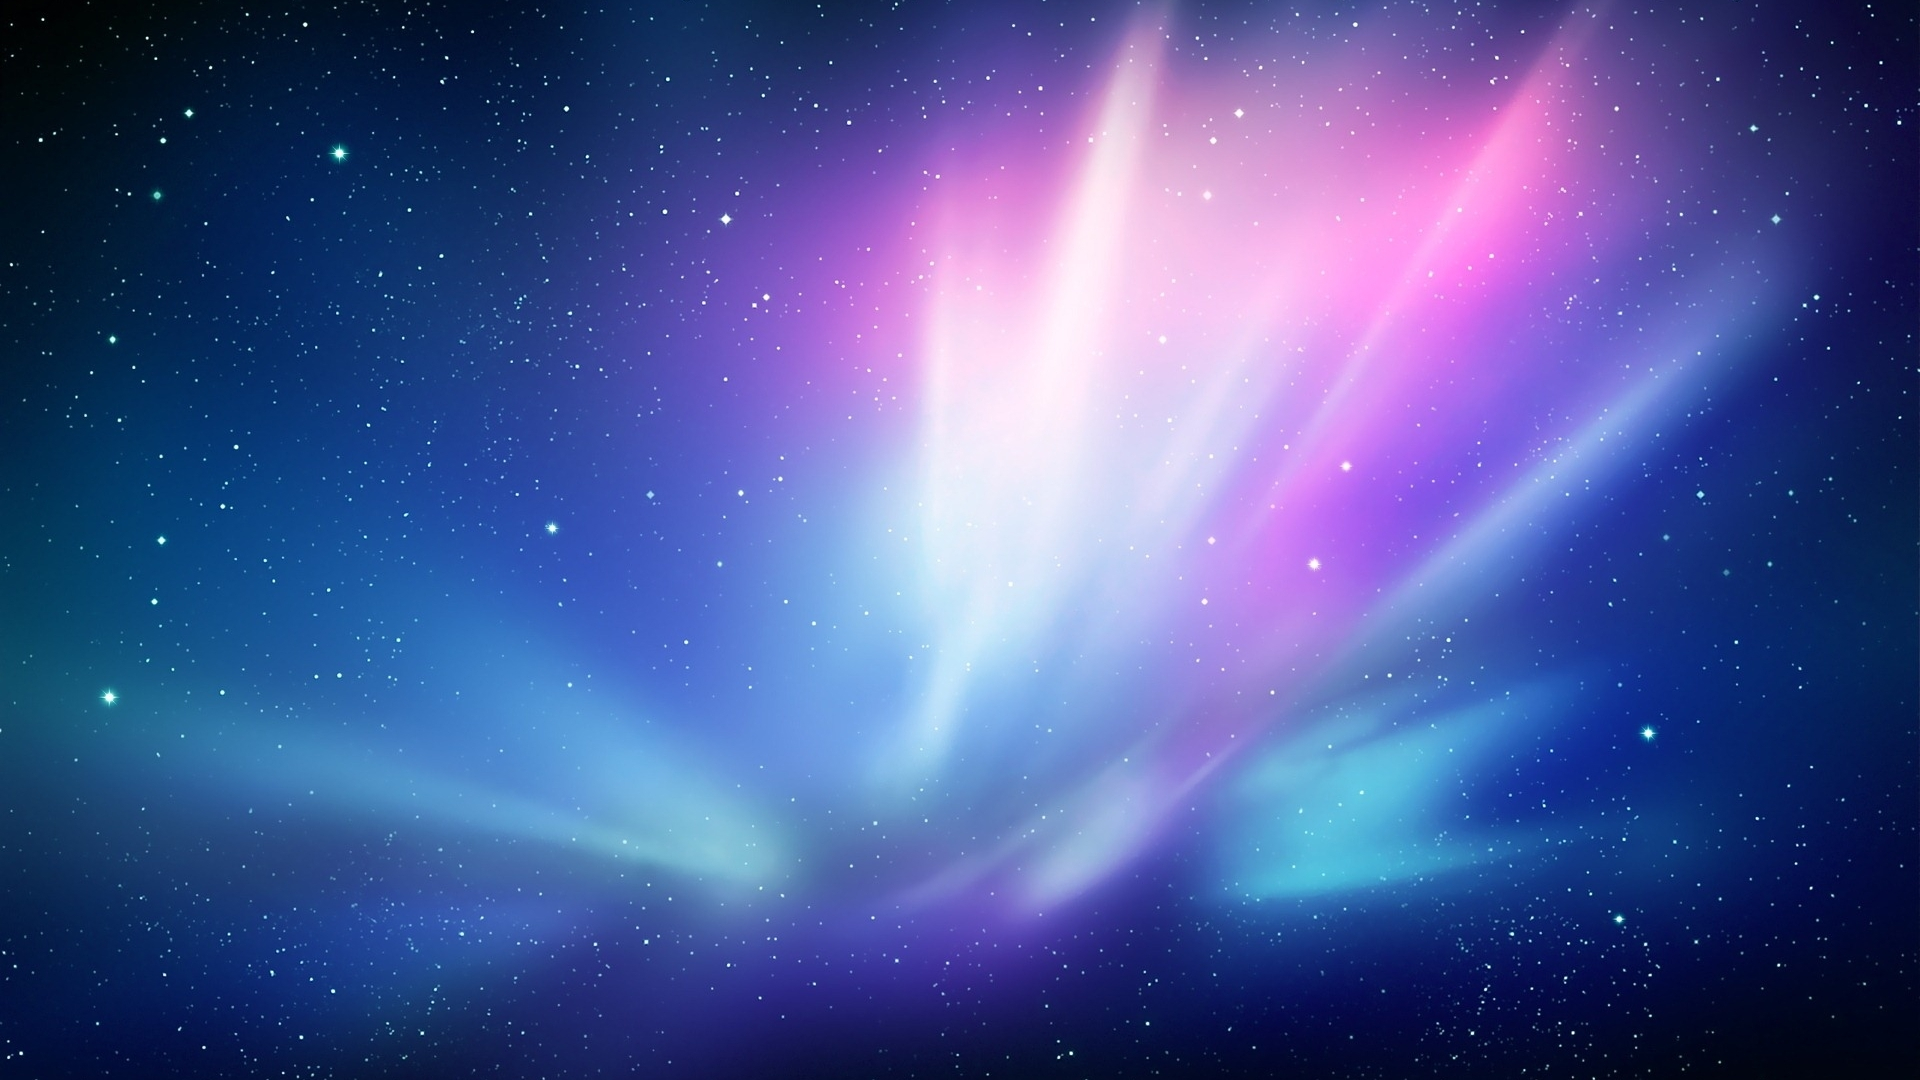 Download Wonderful purple blue galaxy wallpaper in Space wallpapers ...